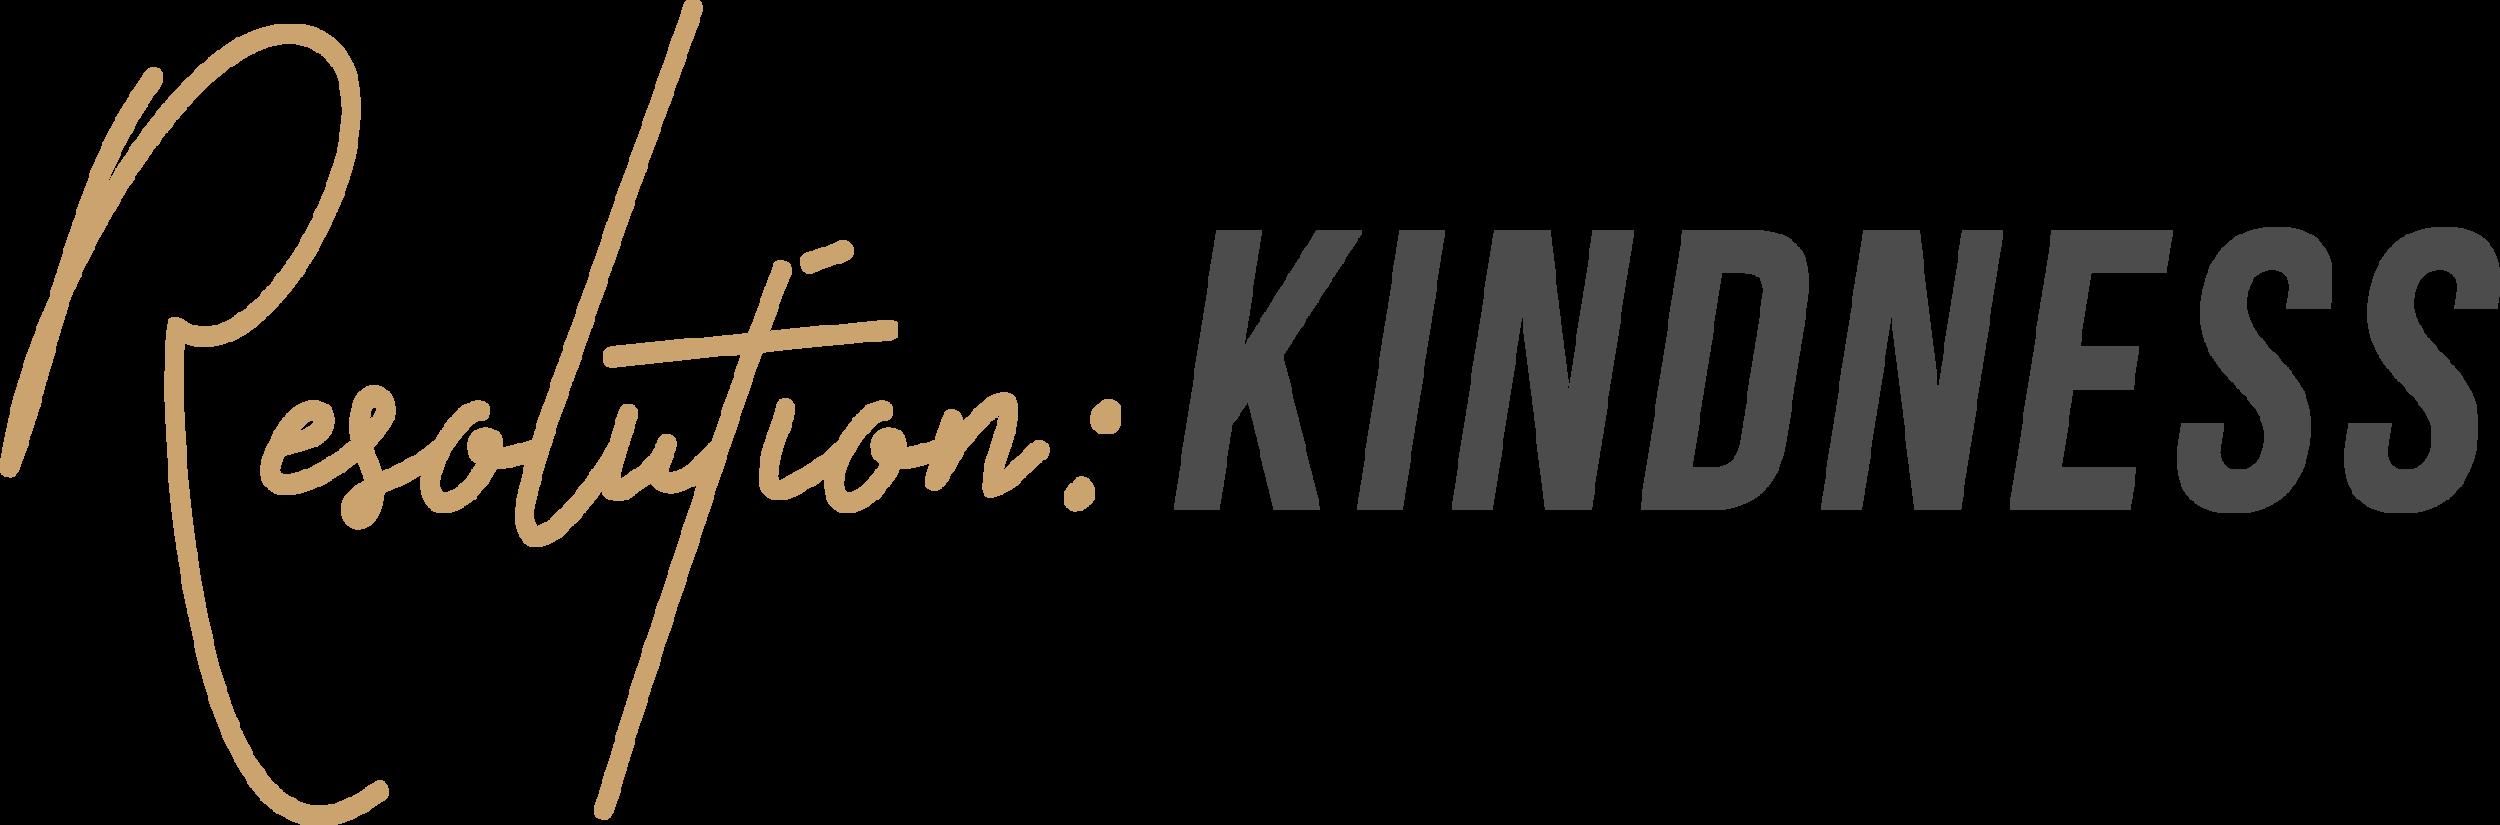 Resolution Kindness Logo.png